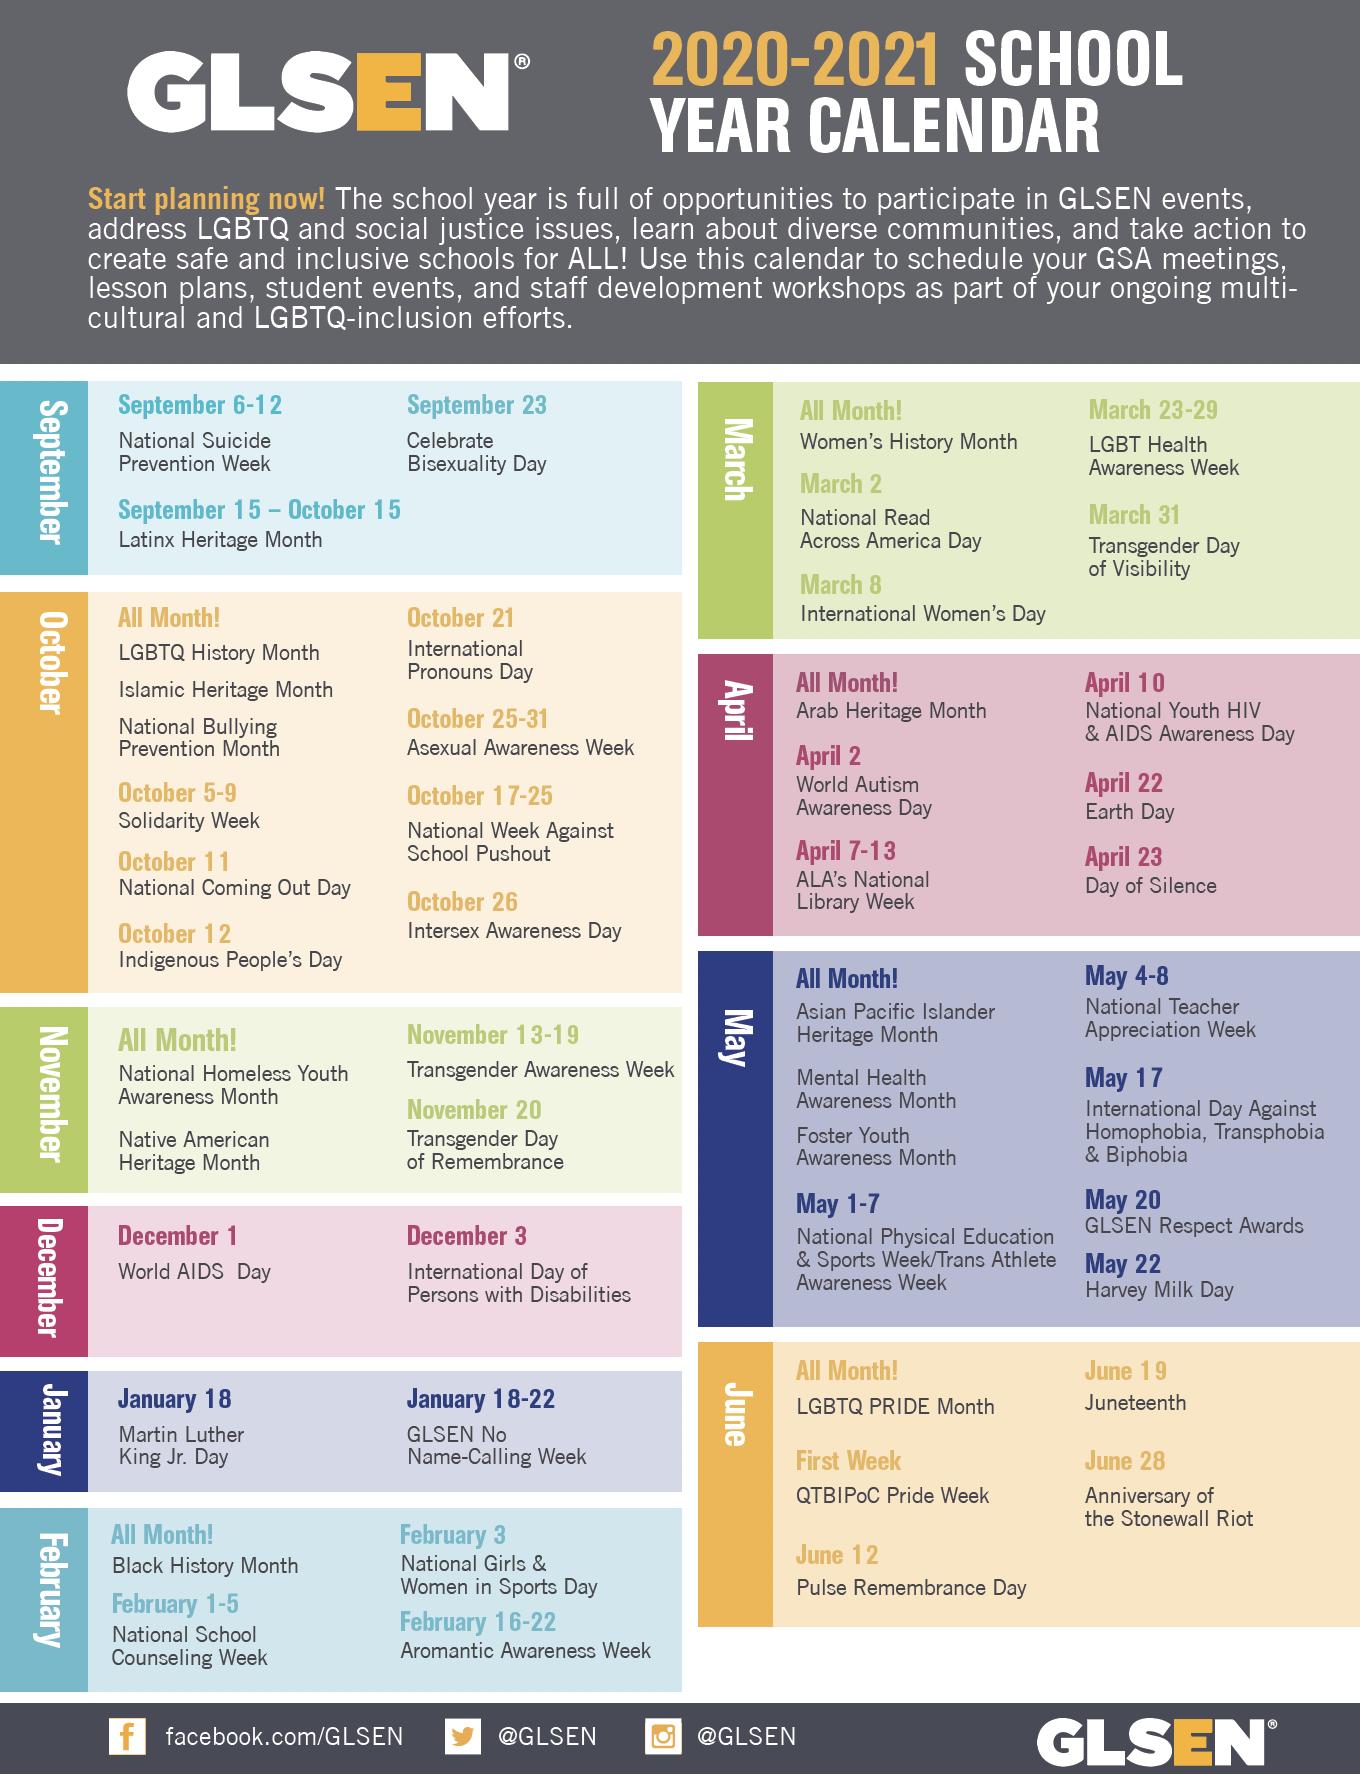 GLSEN's 2020-2021 School Year Calendar